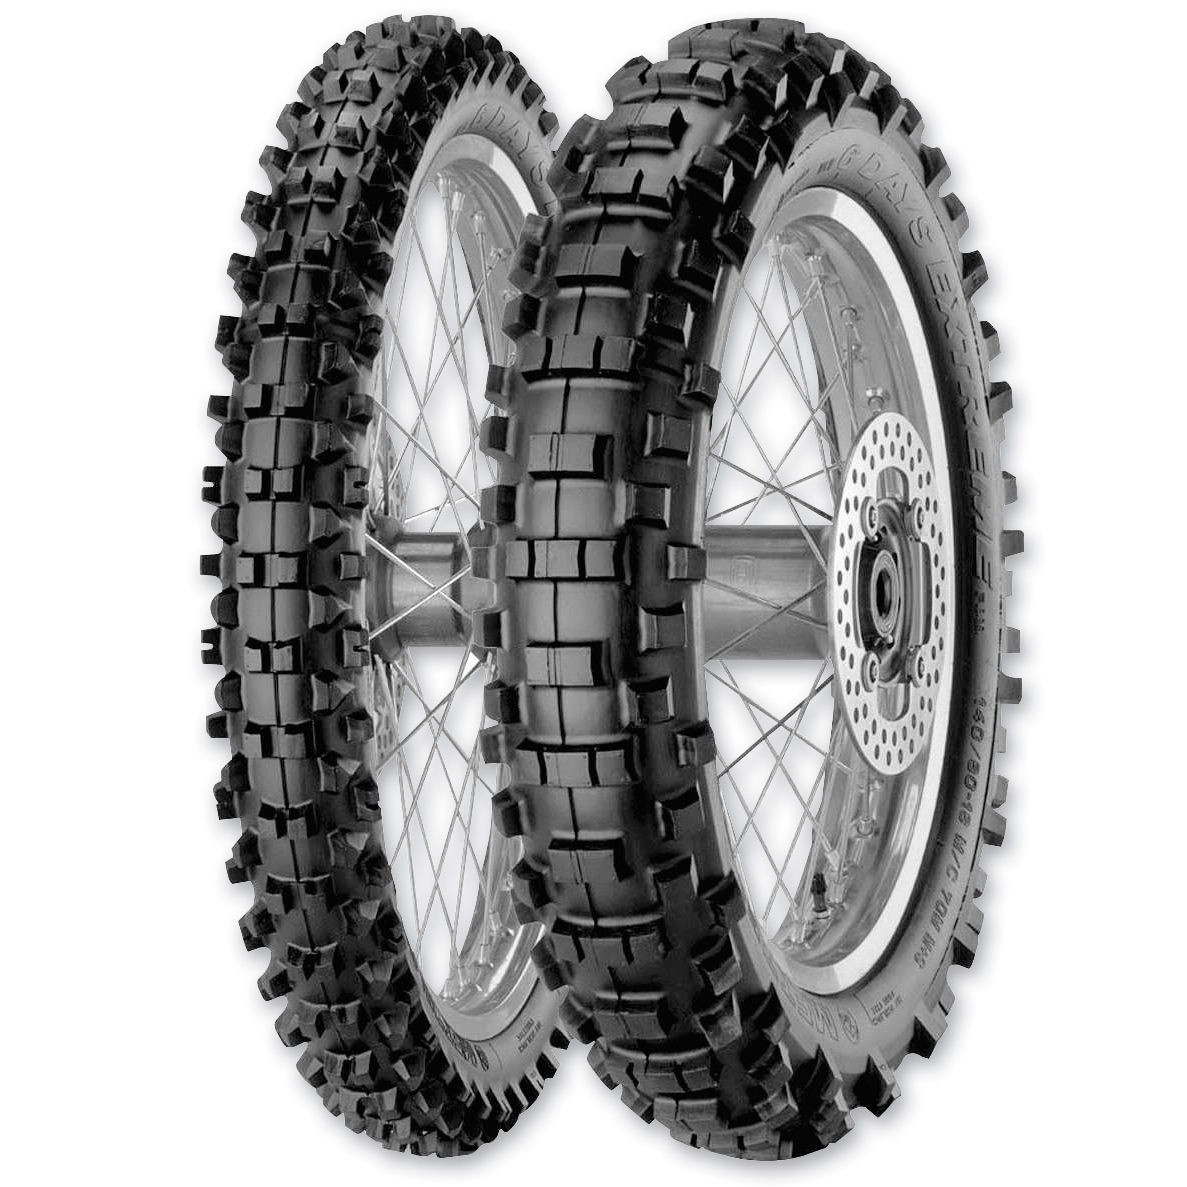 Metzeler 6 Days Extreme 140/80-18 Soft Rear Tire